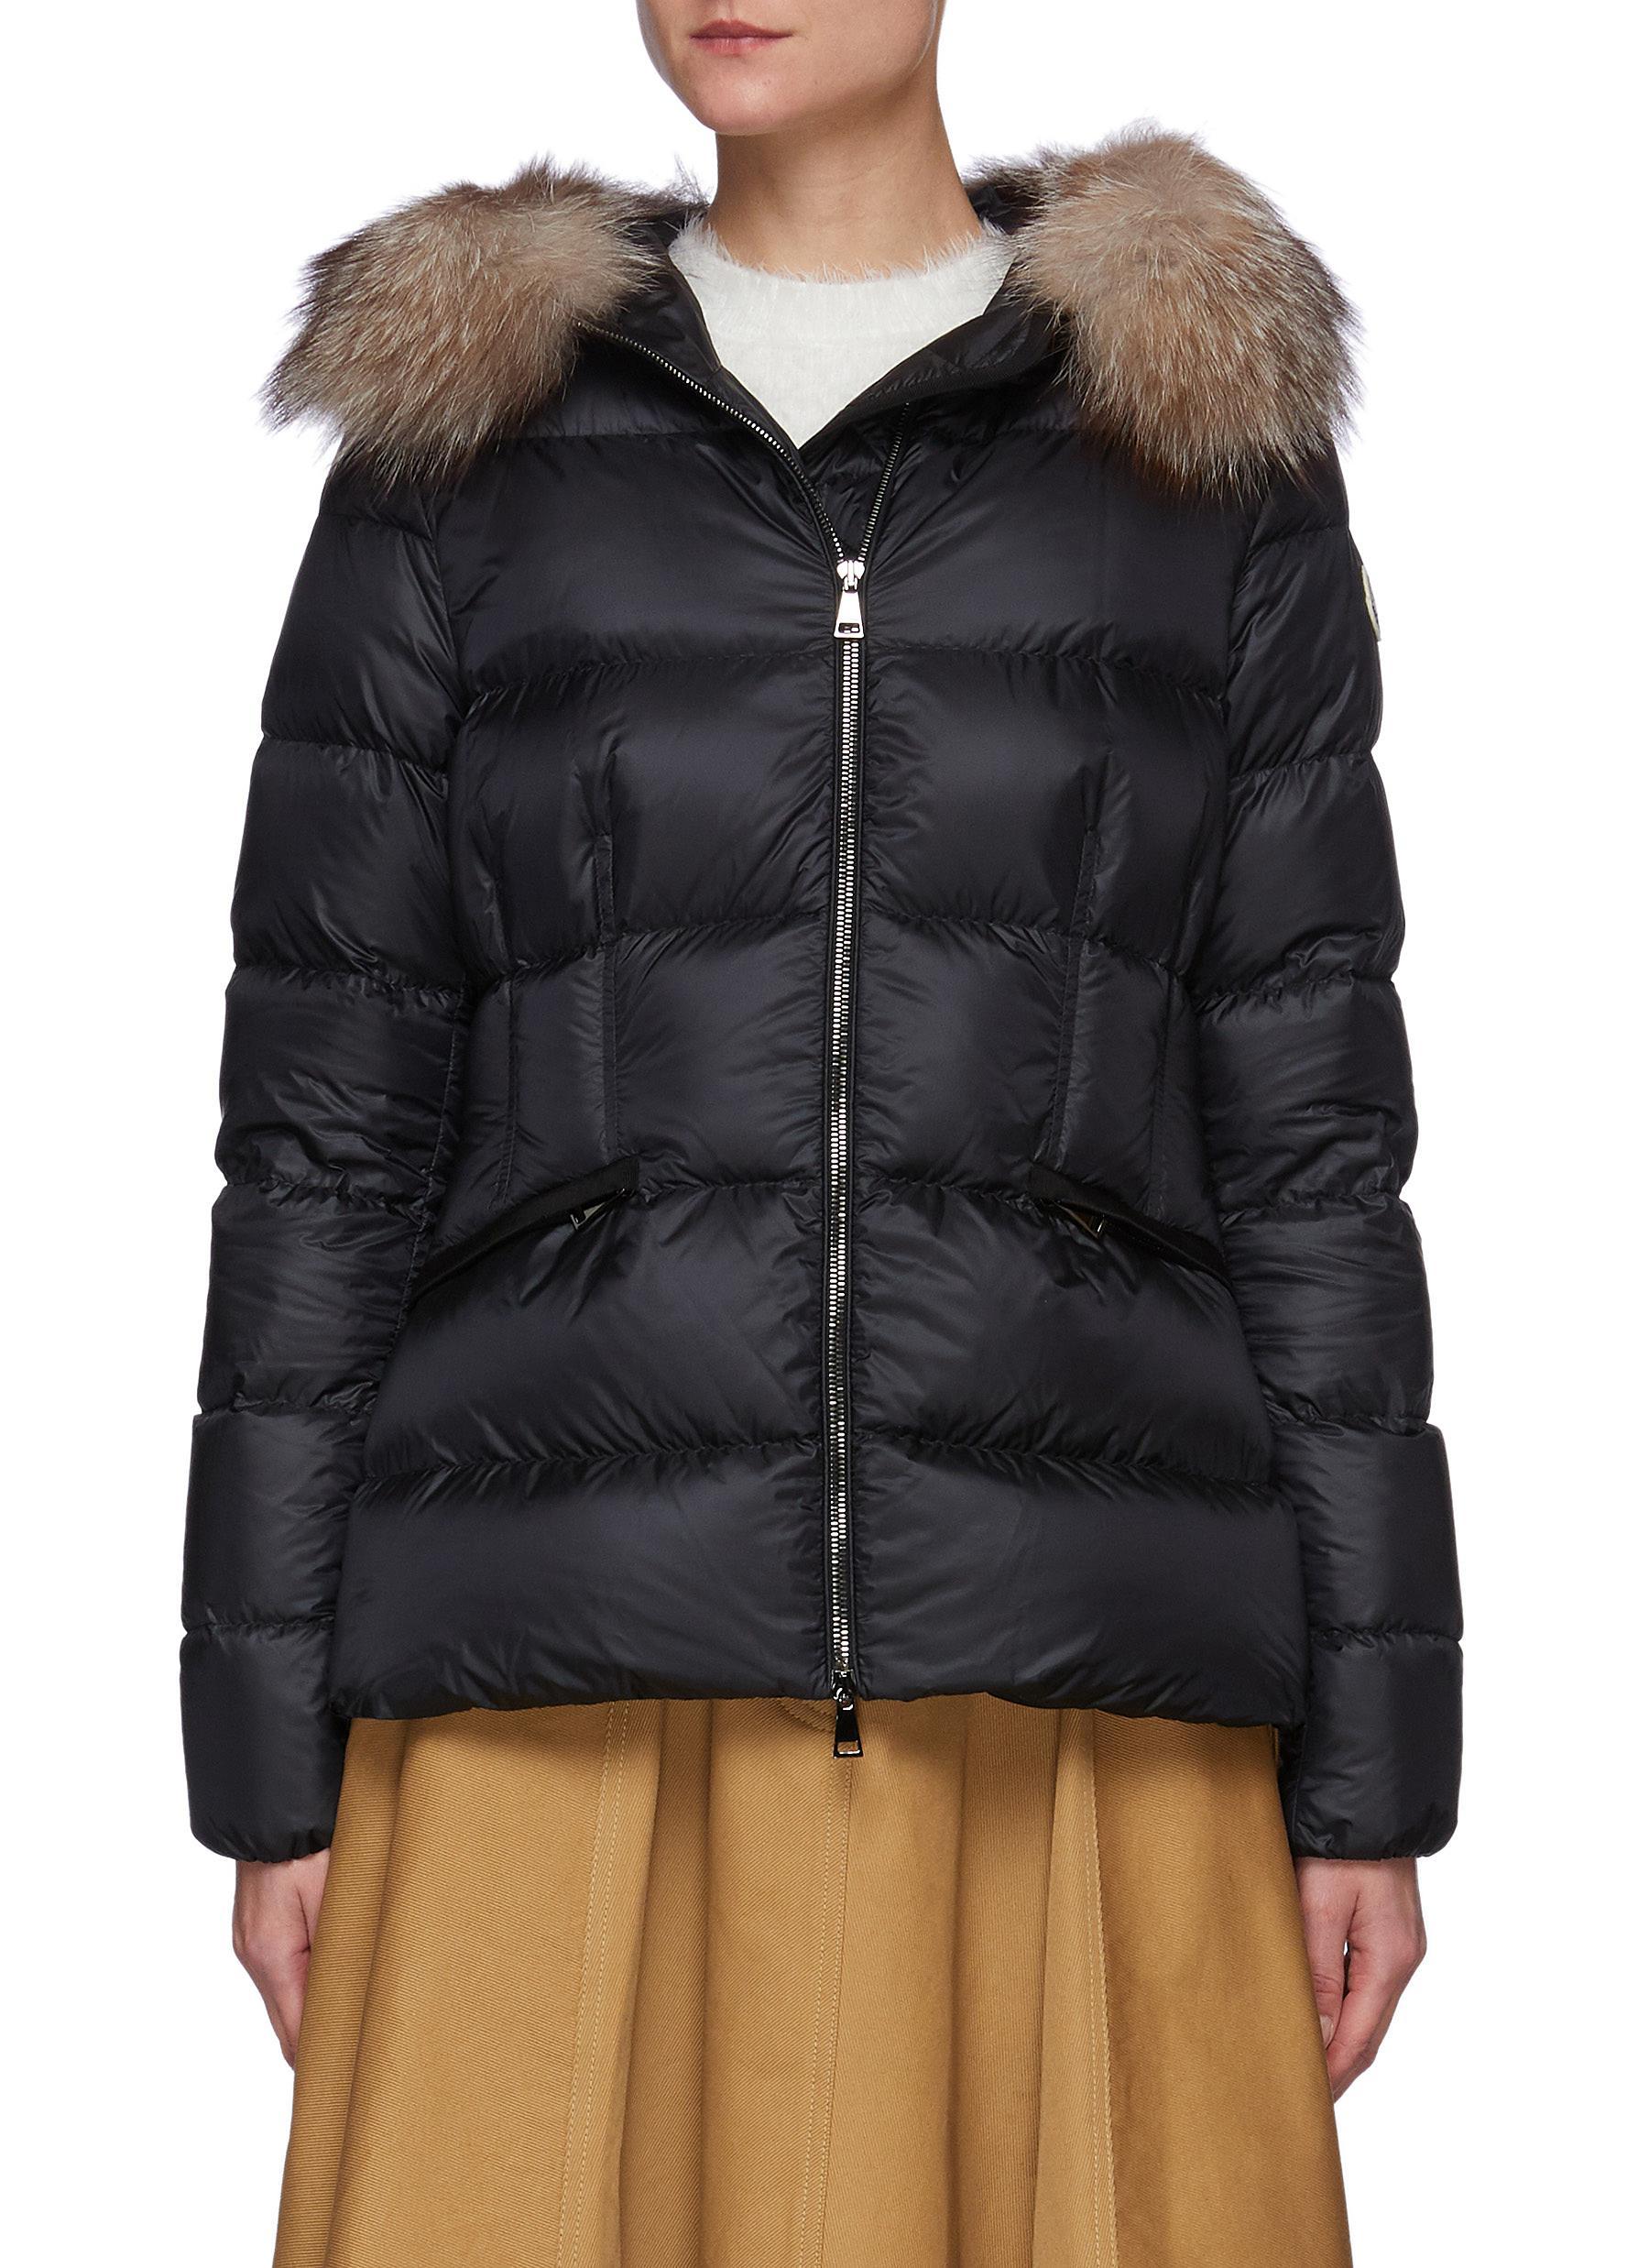 'Boed' Fur Trim Hood Puffer Jacket